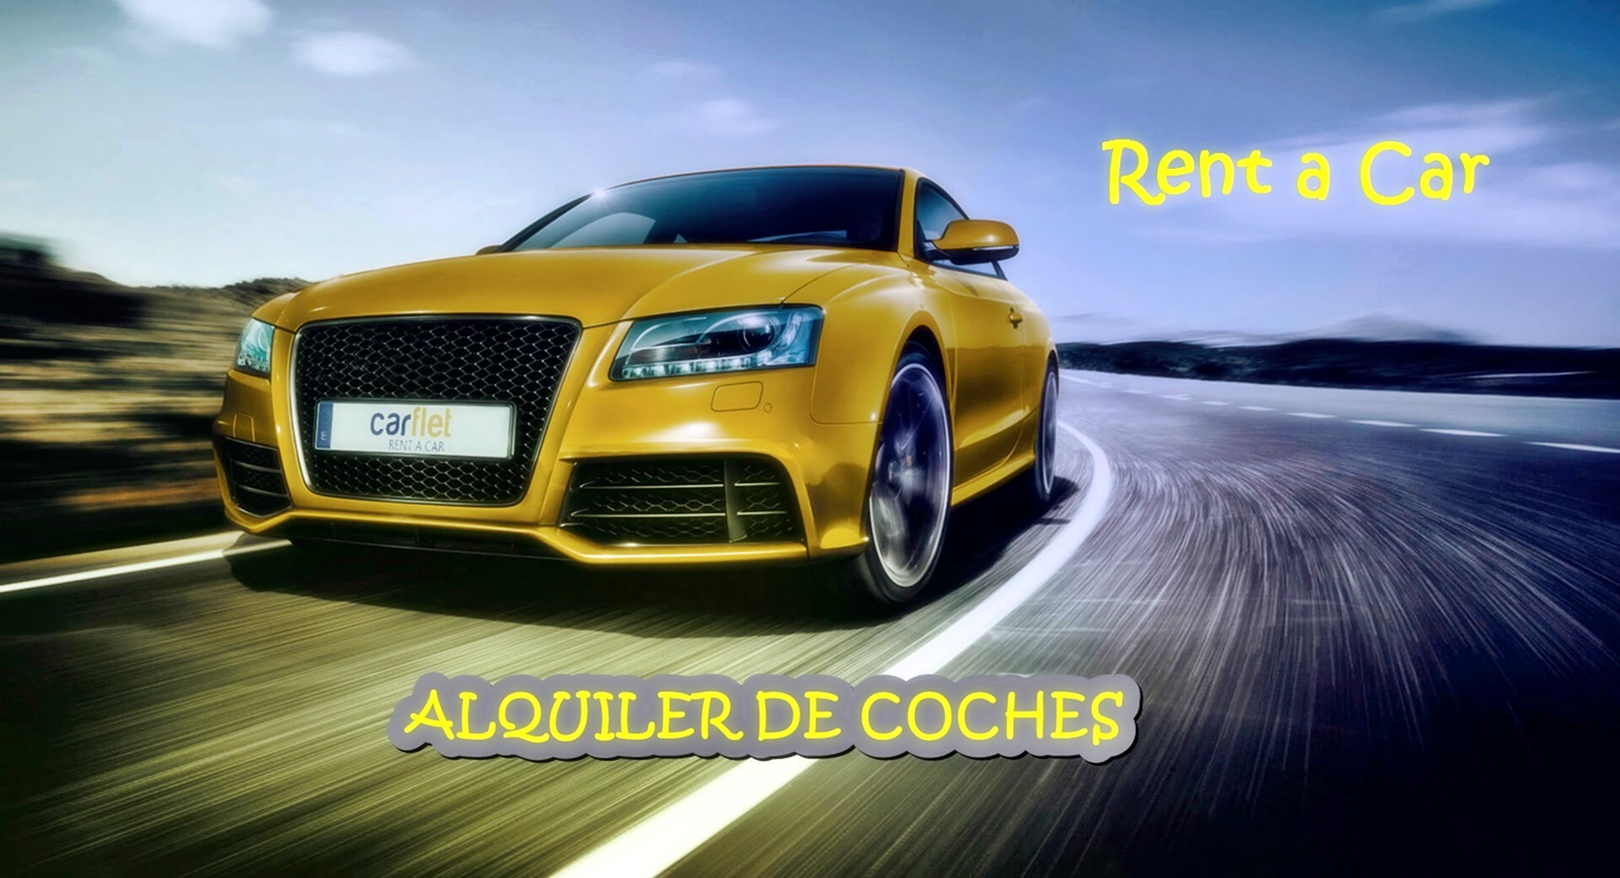 Carflet Rent a Car | Alquiler de Coches - Vehículos - photo#31